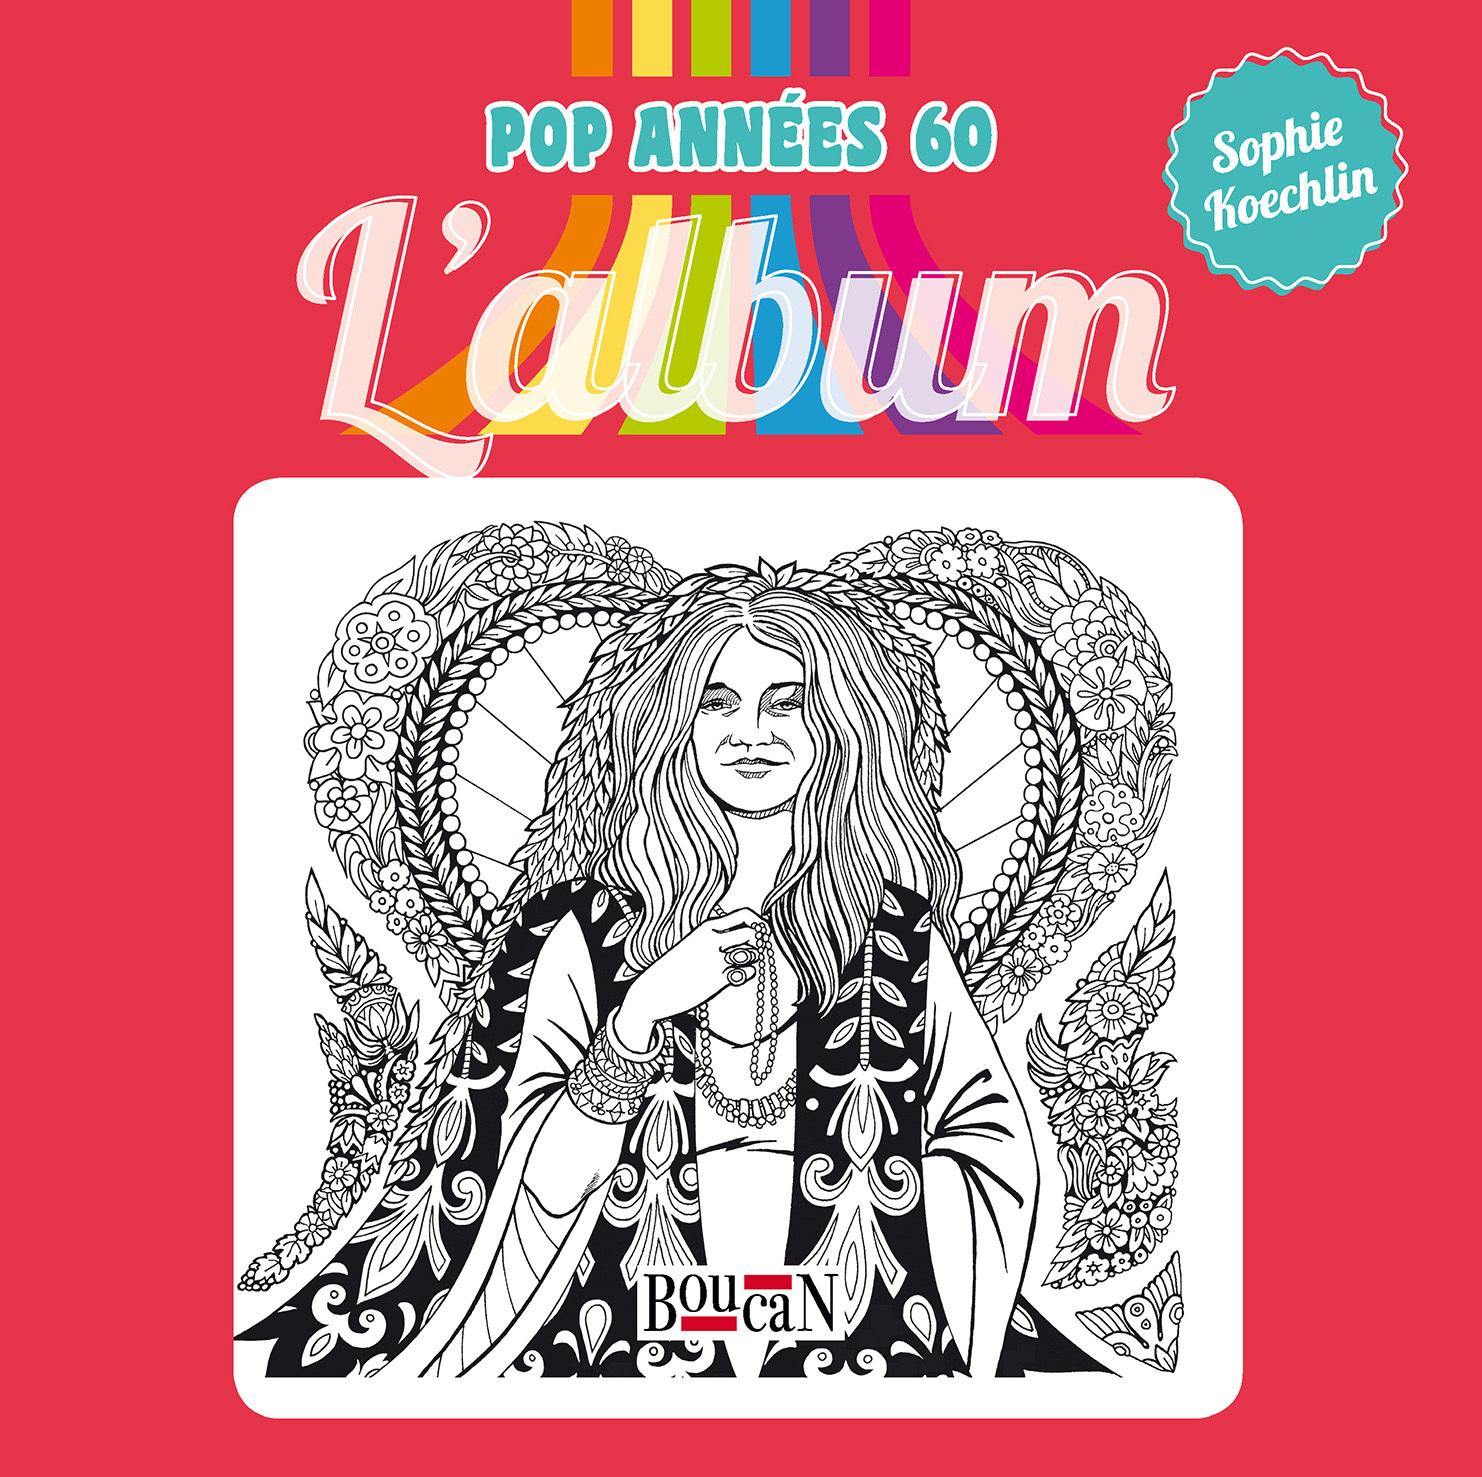 POP ANNEES 60, L'ALBUM